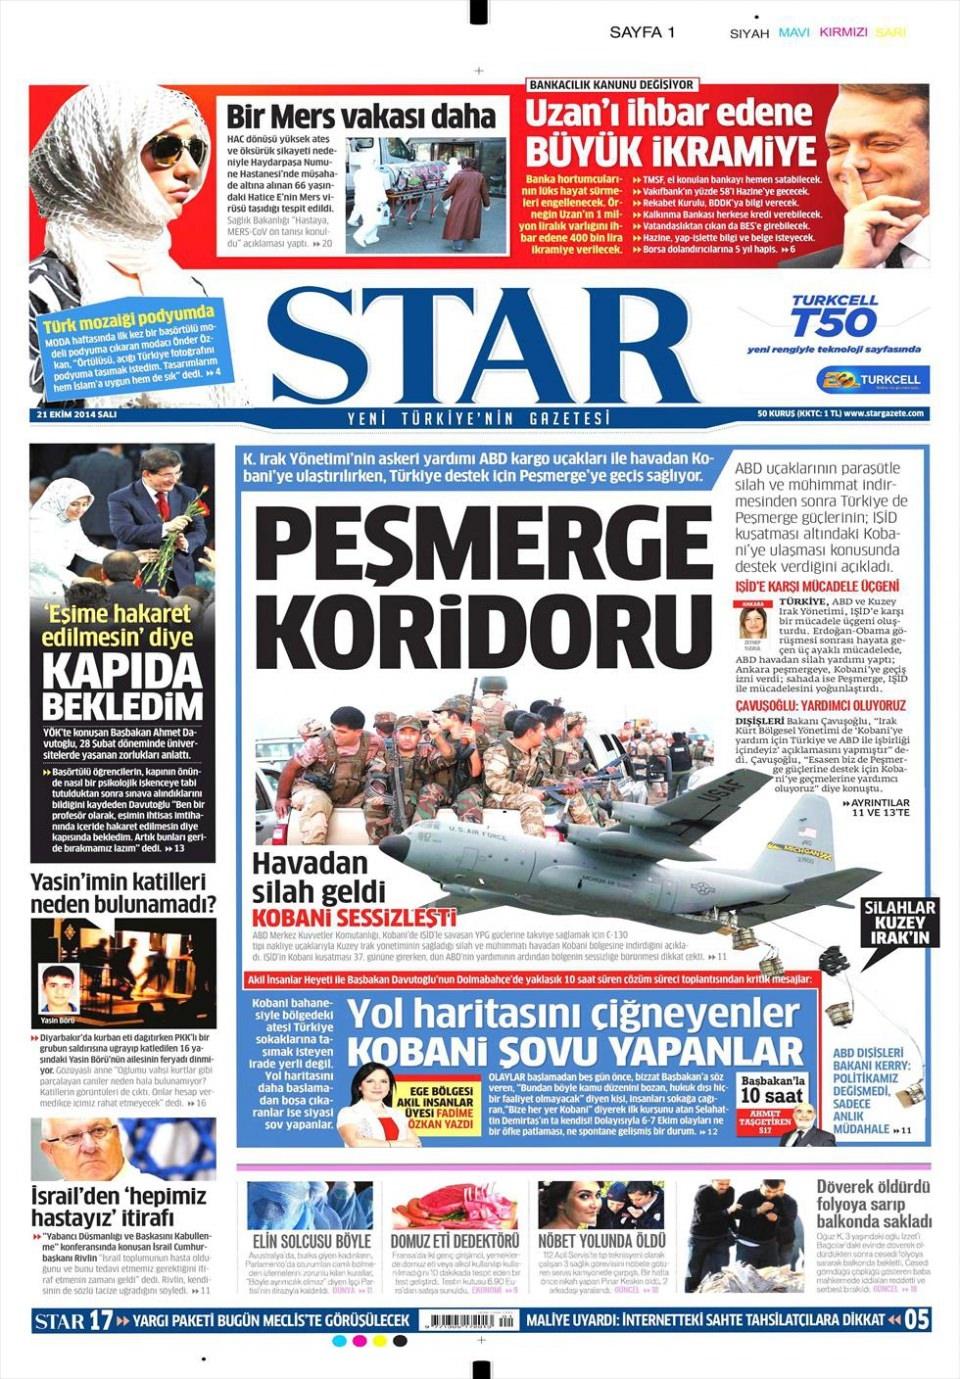 21 Ekim 2014 gazete manşetleri 16